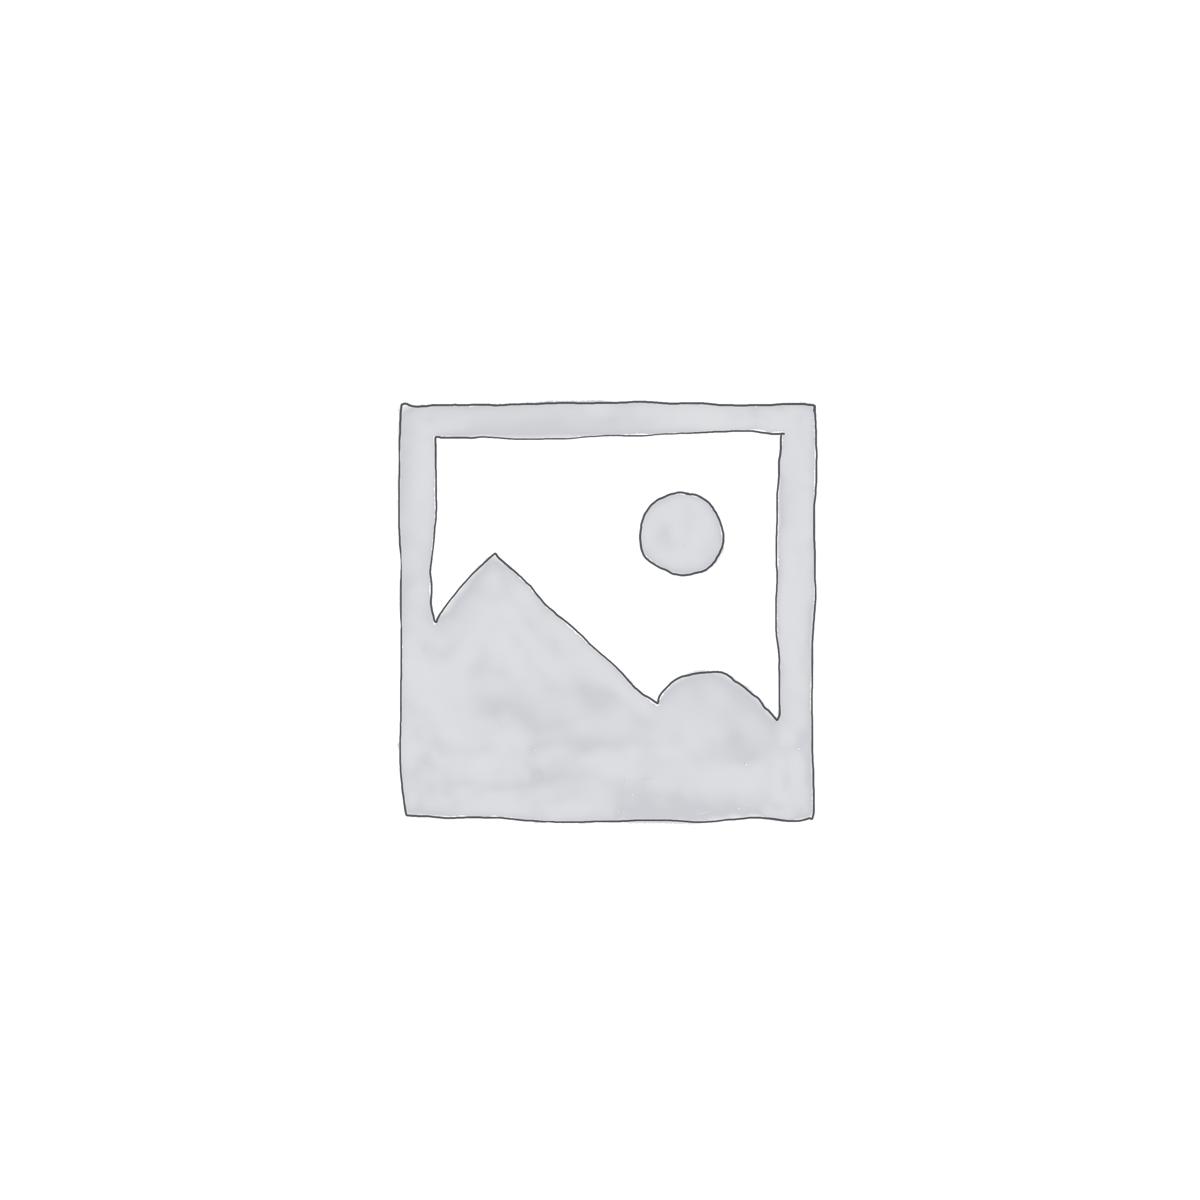 Nursery Mountain Landscape with Hot Air Balloons Wallpaper Mural